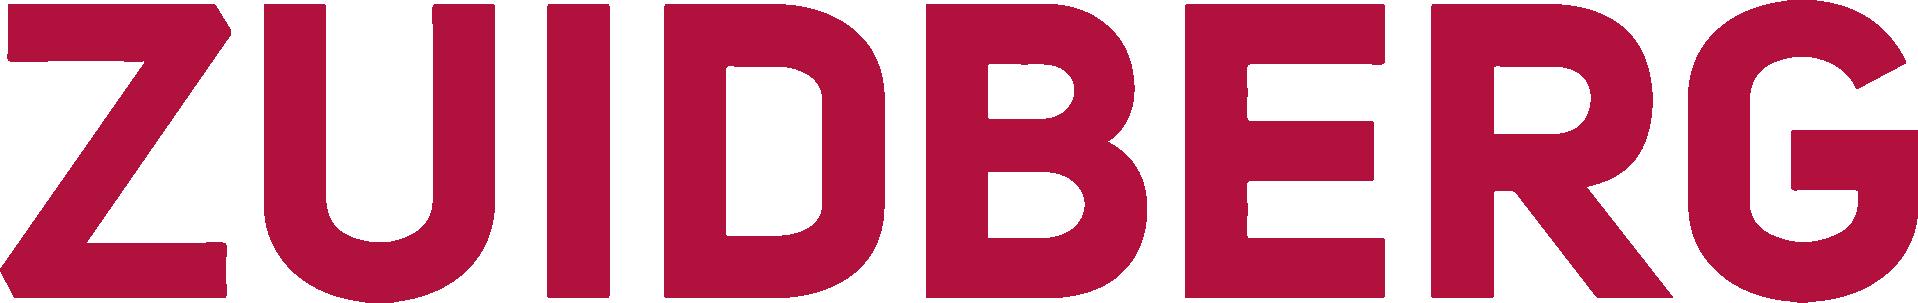 Zuidberg logo kleur